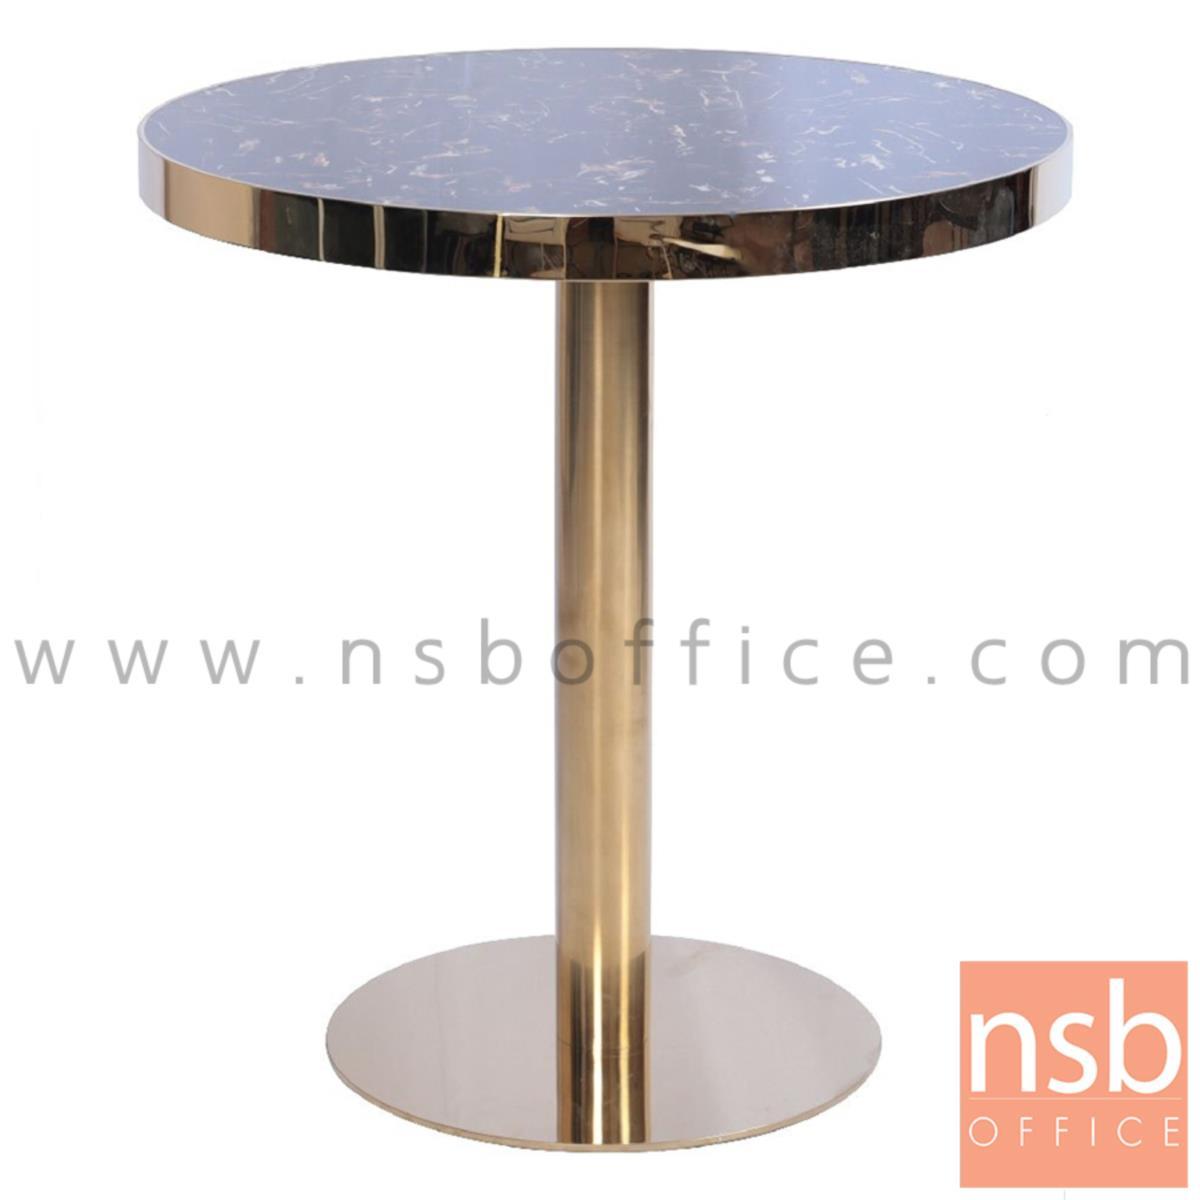 A14A251:โต๊ะบาร์ COFFEE รุ่น Ferra (แฟร์รา) ขนาด 70Di cm. หน้าท็อปไม้ลายหินอ่อน ขาเหล็กทอง